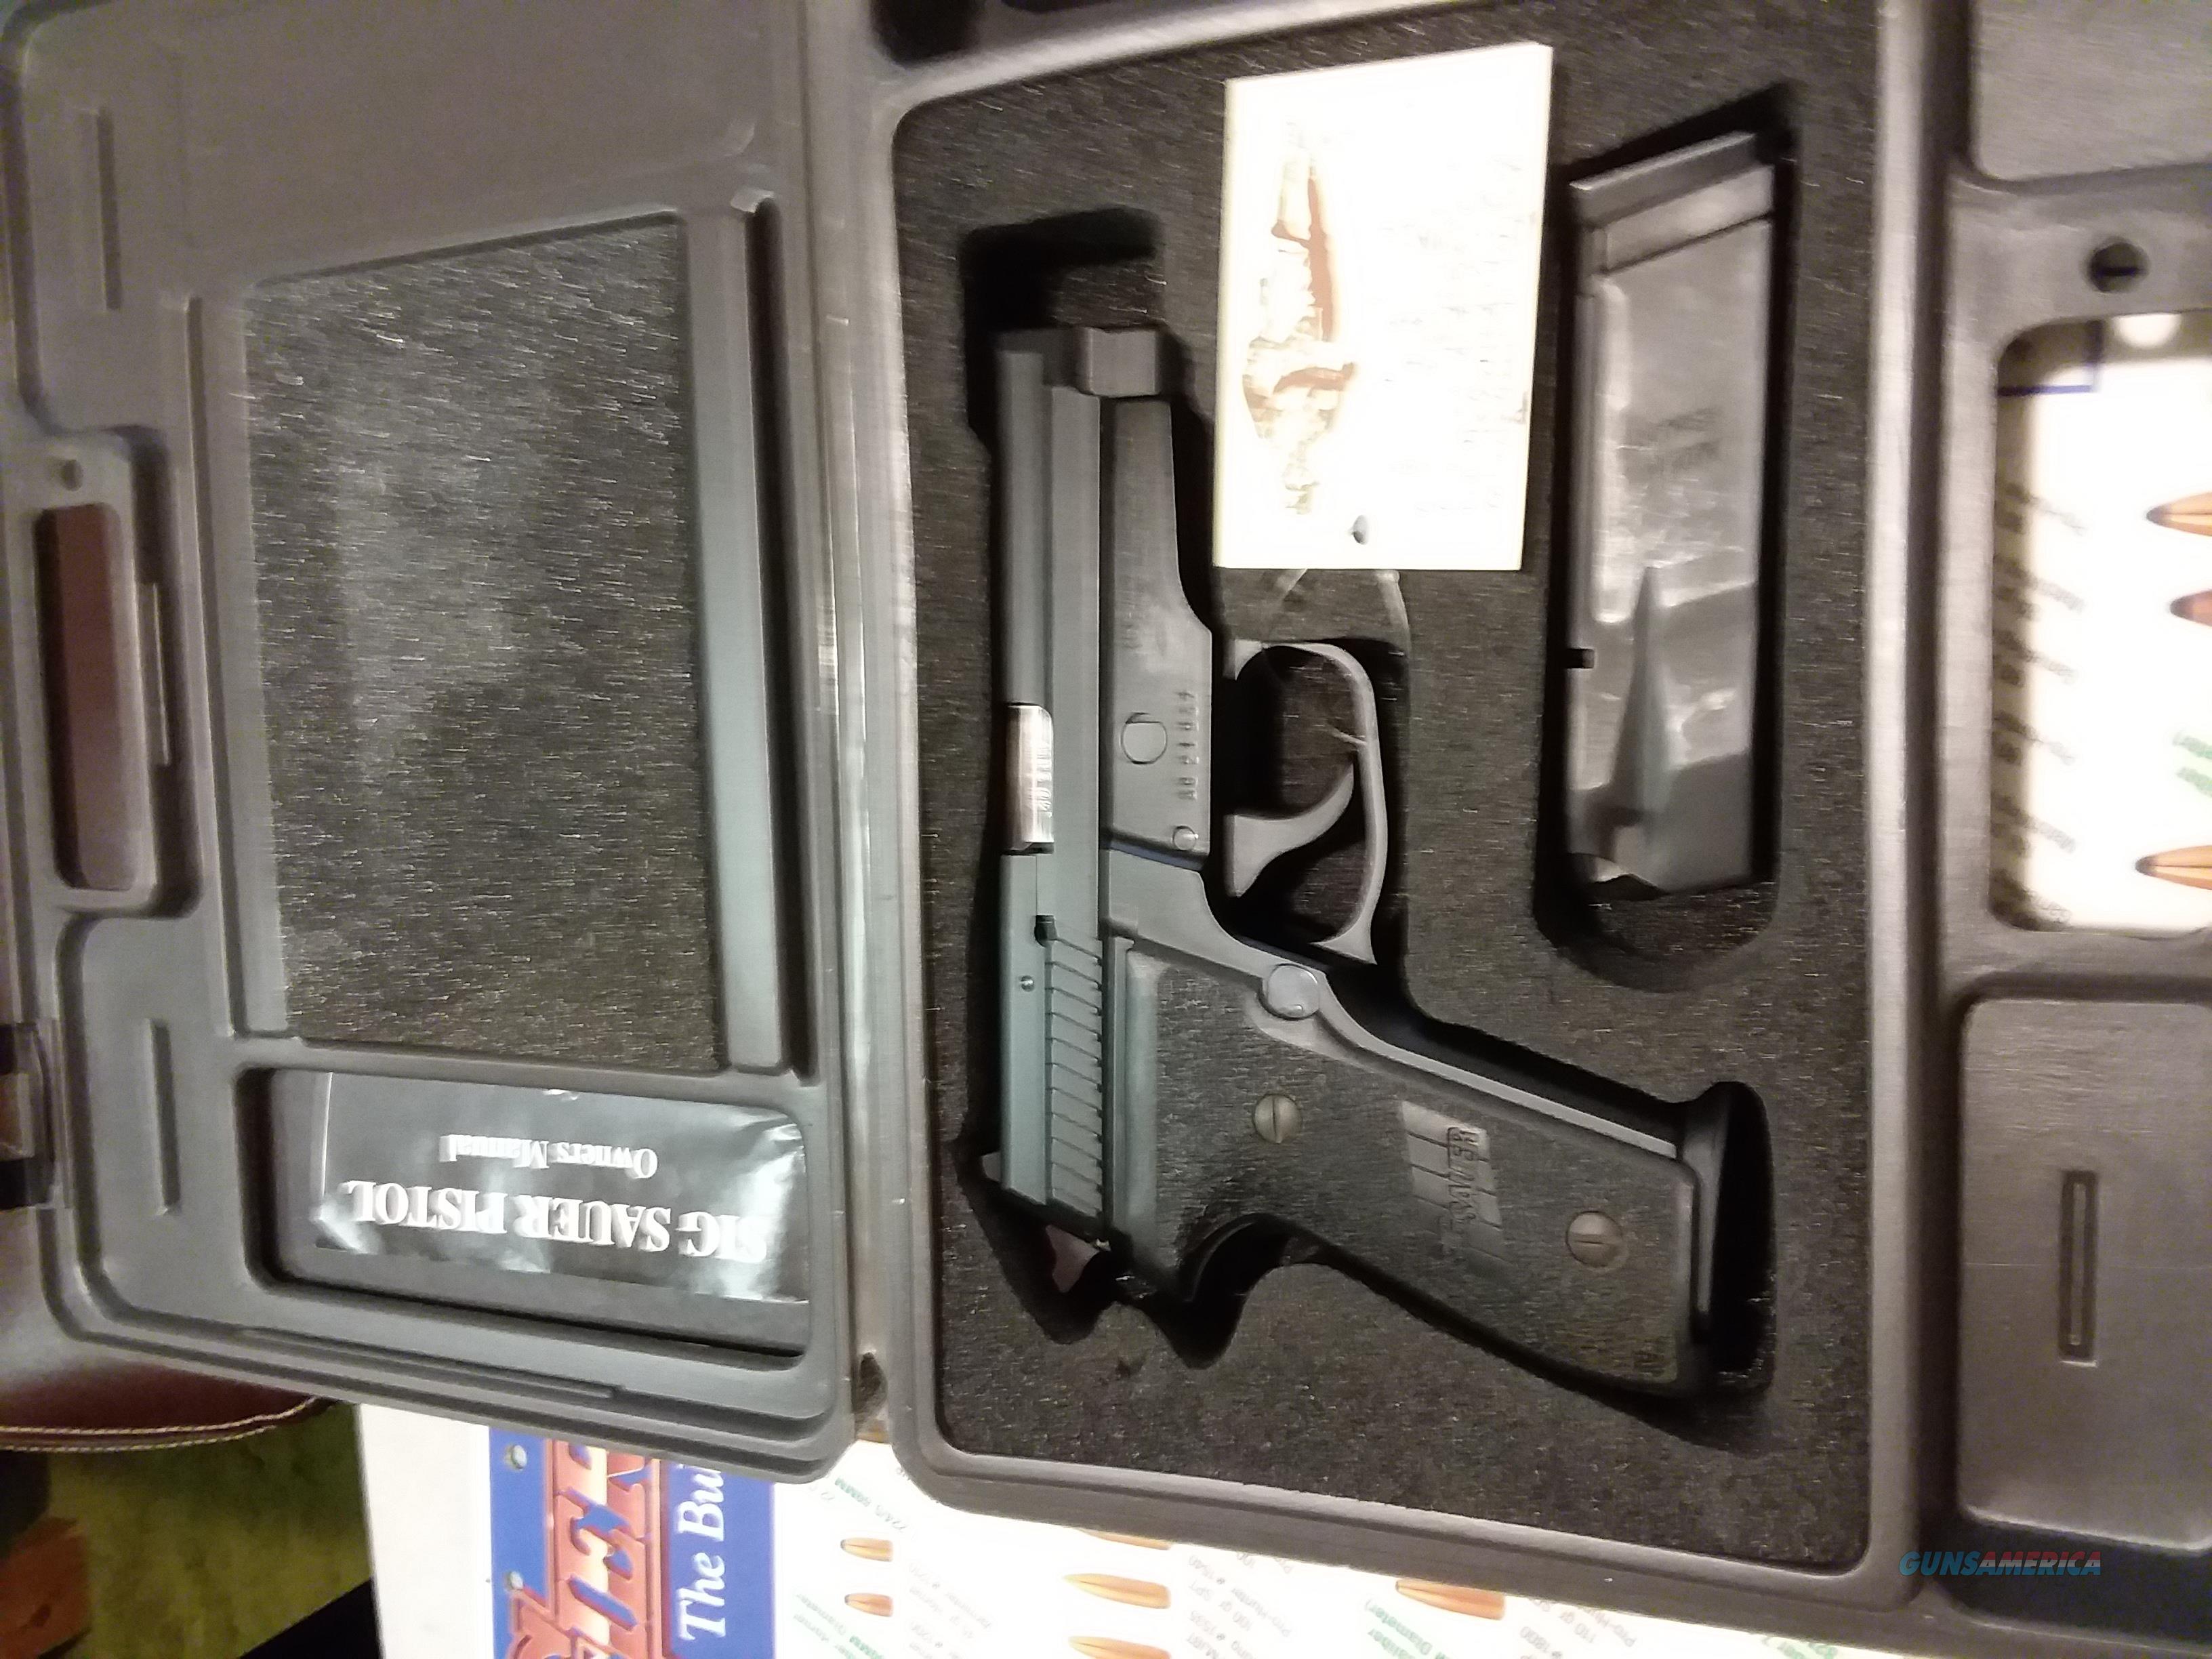 "SIG SAUER P229 40 S&W 3.9"" Barrel Used SS SLIDE Blackened  Guns > Pistols > Sig - Sauer/Sigarms Pistols > P229"